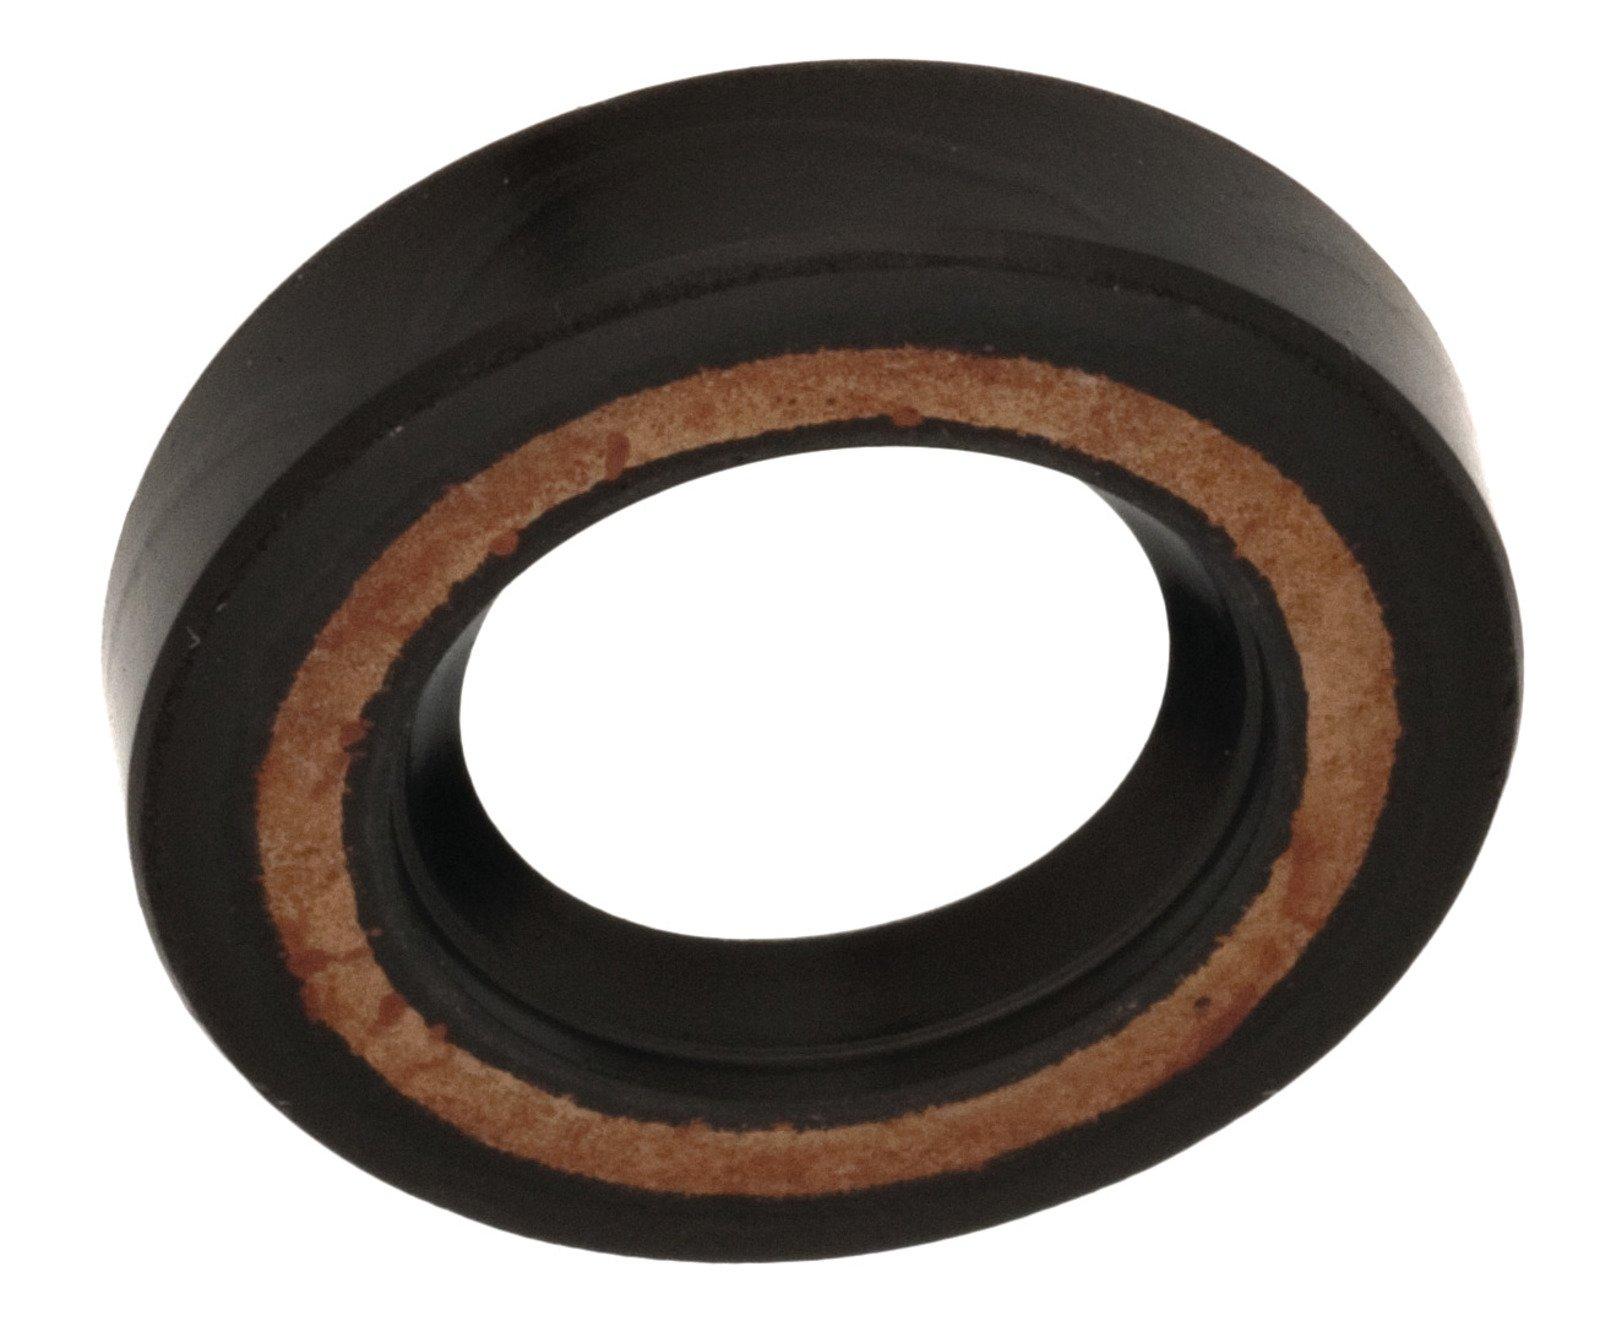 Genuine Yamaha Right Hand Crankshaft Oil Seal 14x25x5.5-583 For Yamaha TT500 XT500 SR500 93101-14089-00 29-A02